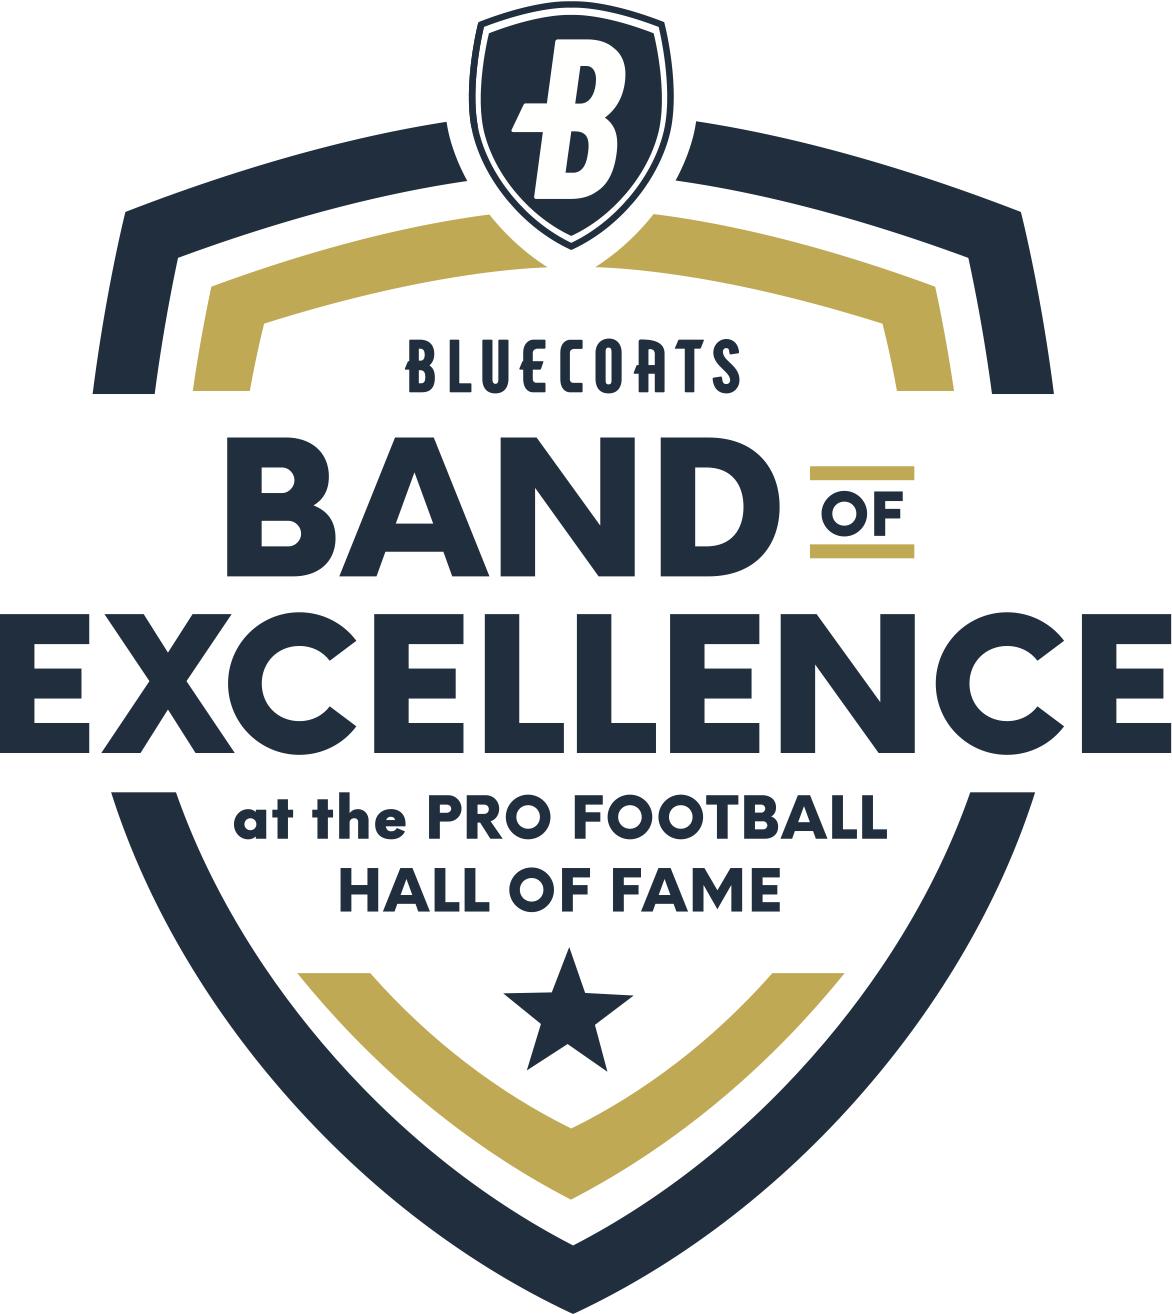 Bluecoats Band of Excellence logo